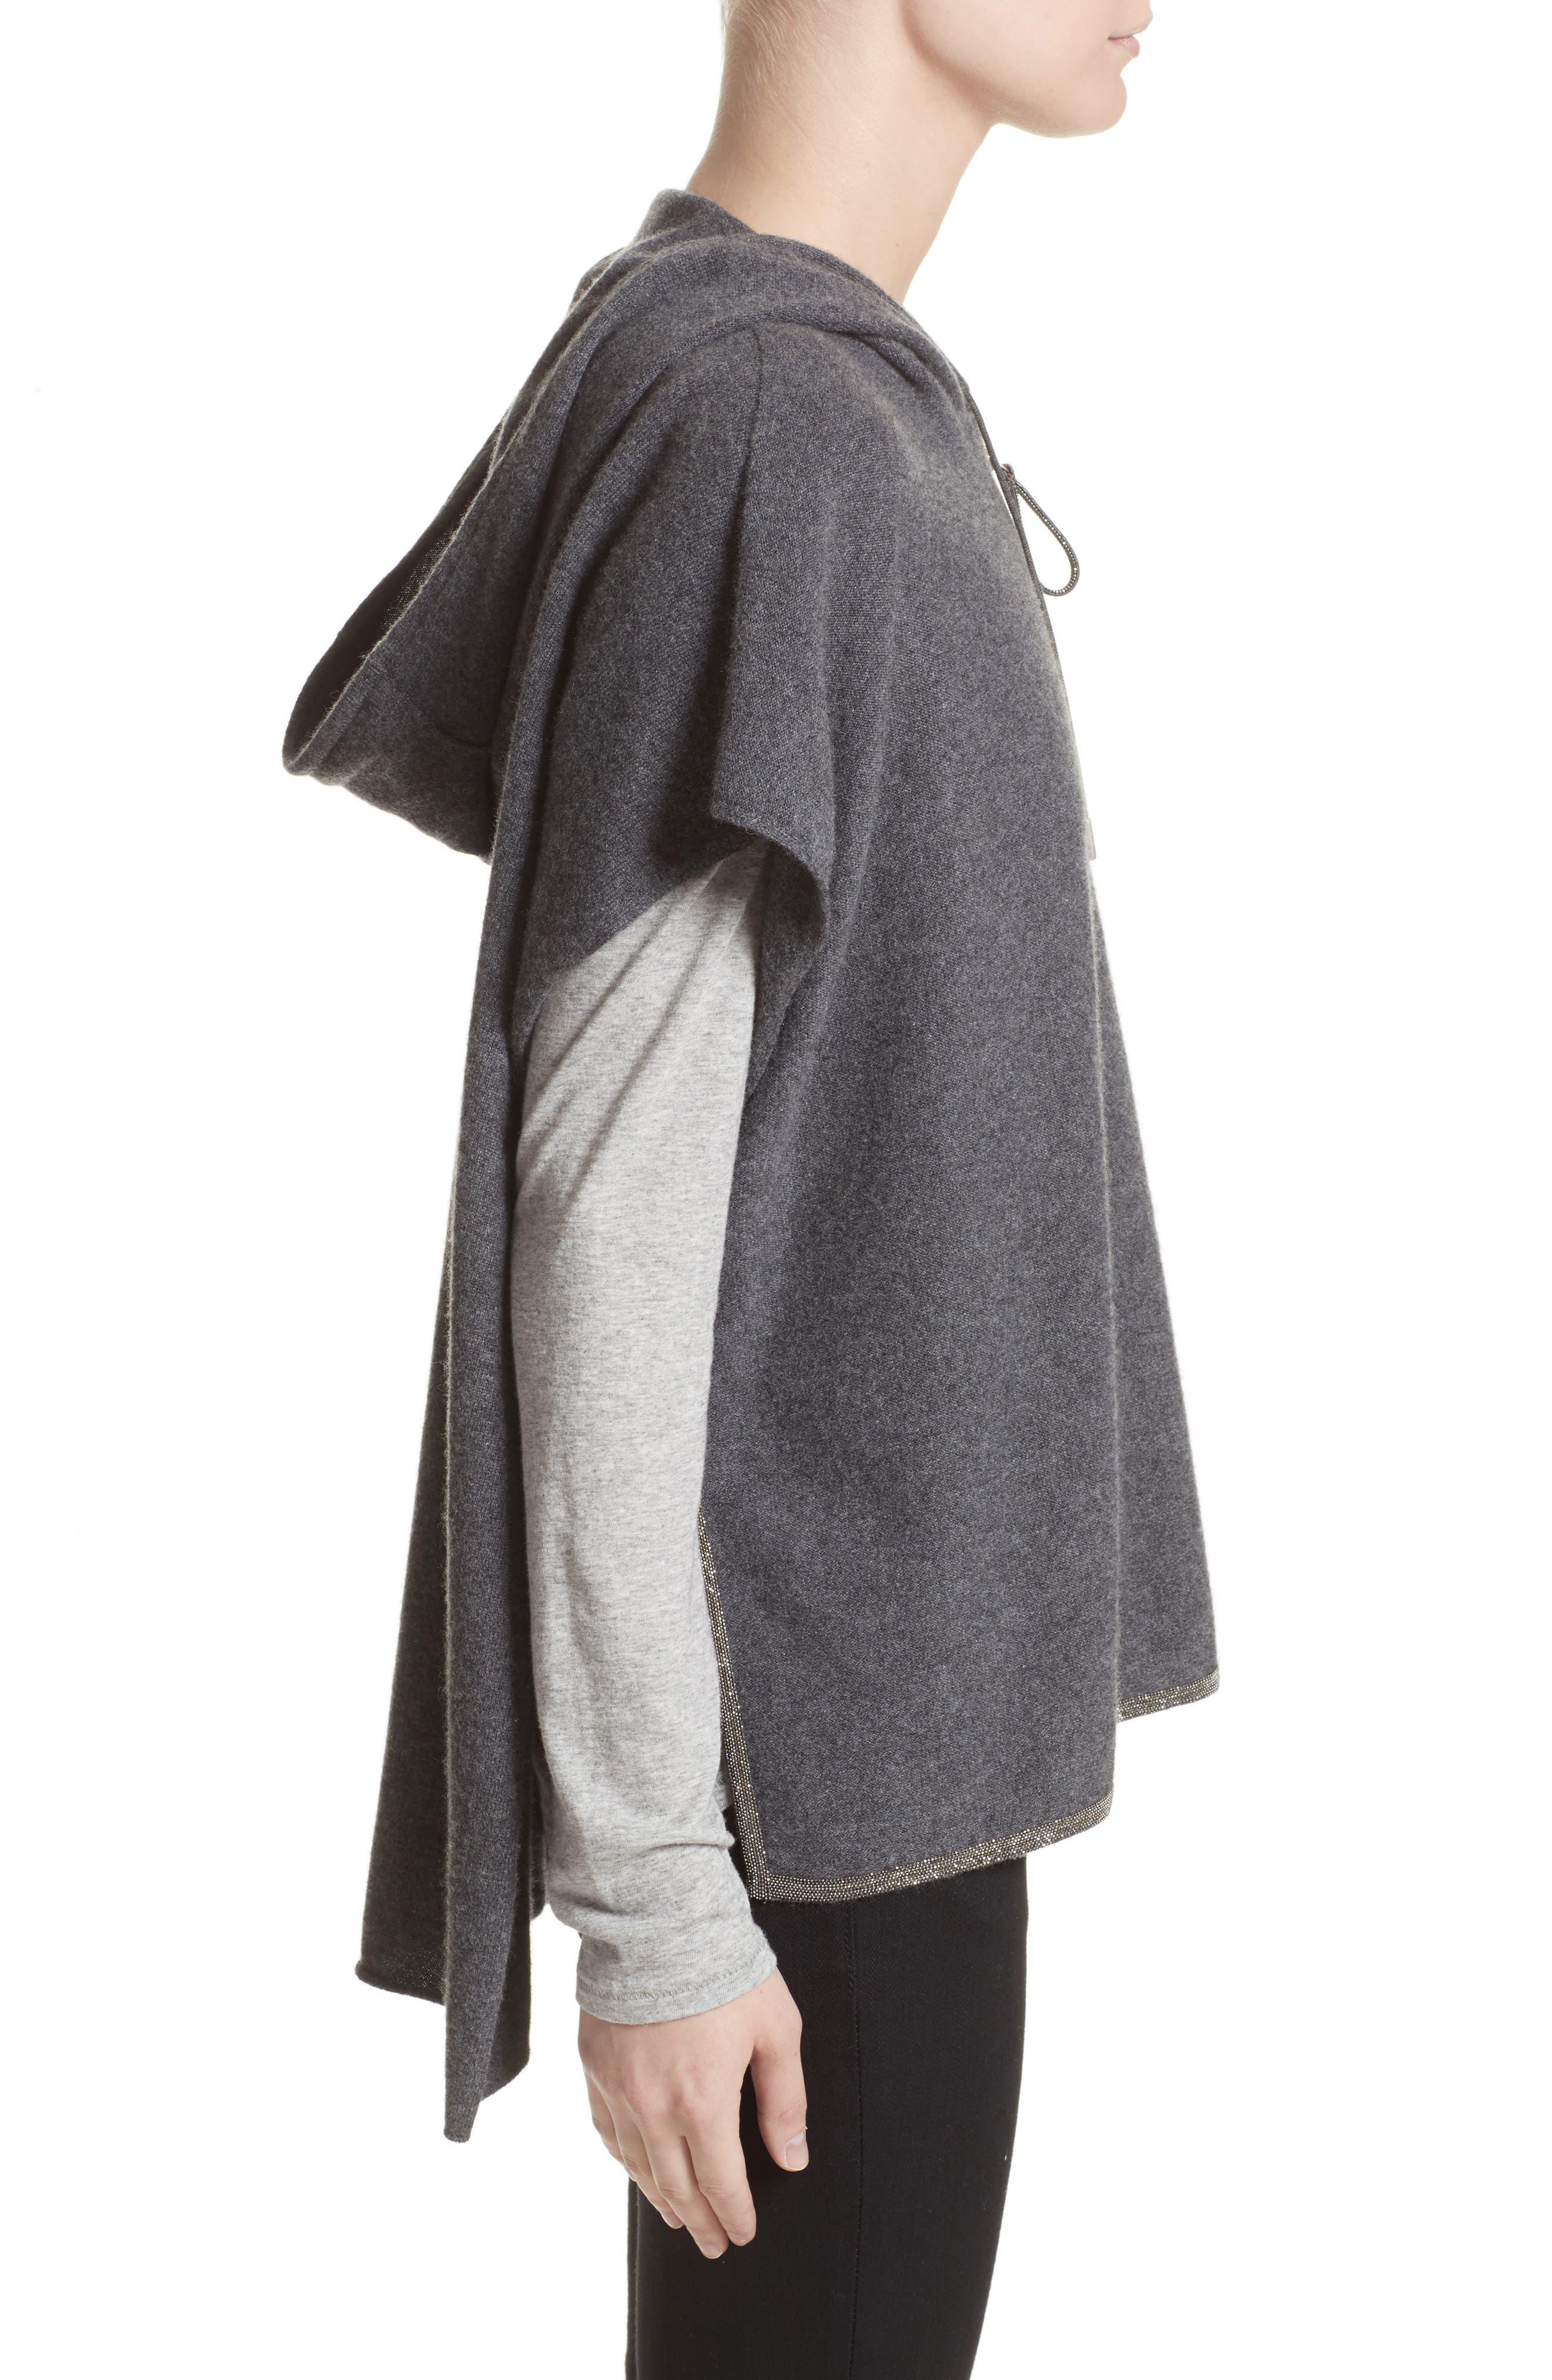 FABIANA FILIPPI,                             Cashmere Hooded Poncho,                             Alternate thumbnail 3, color,                             019